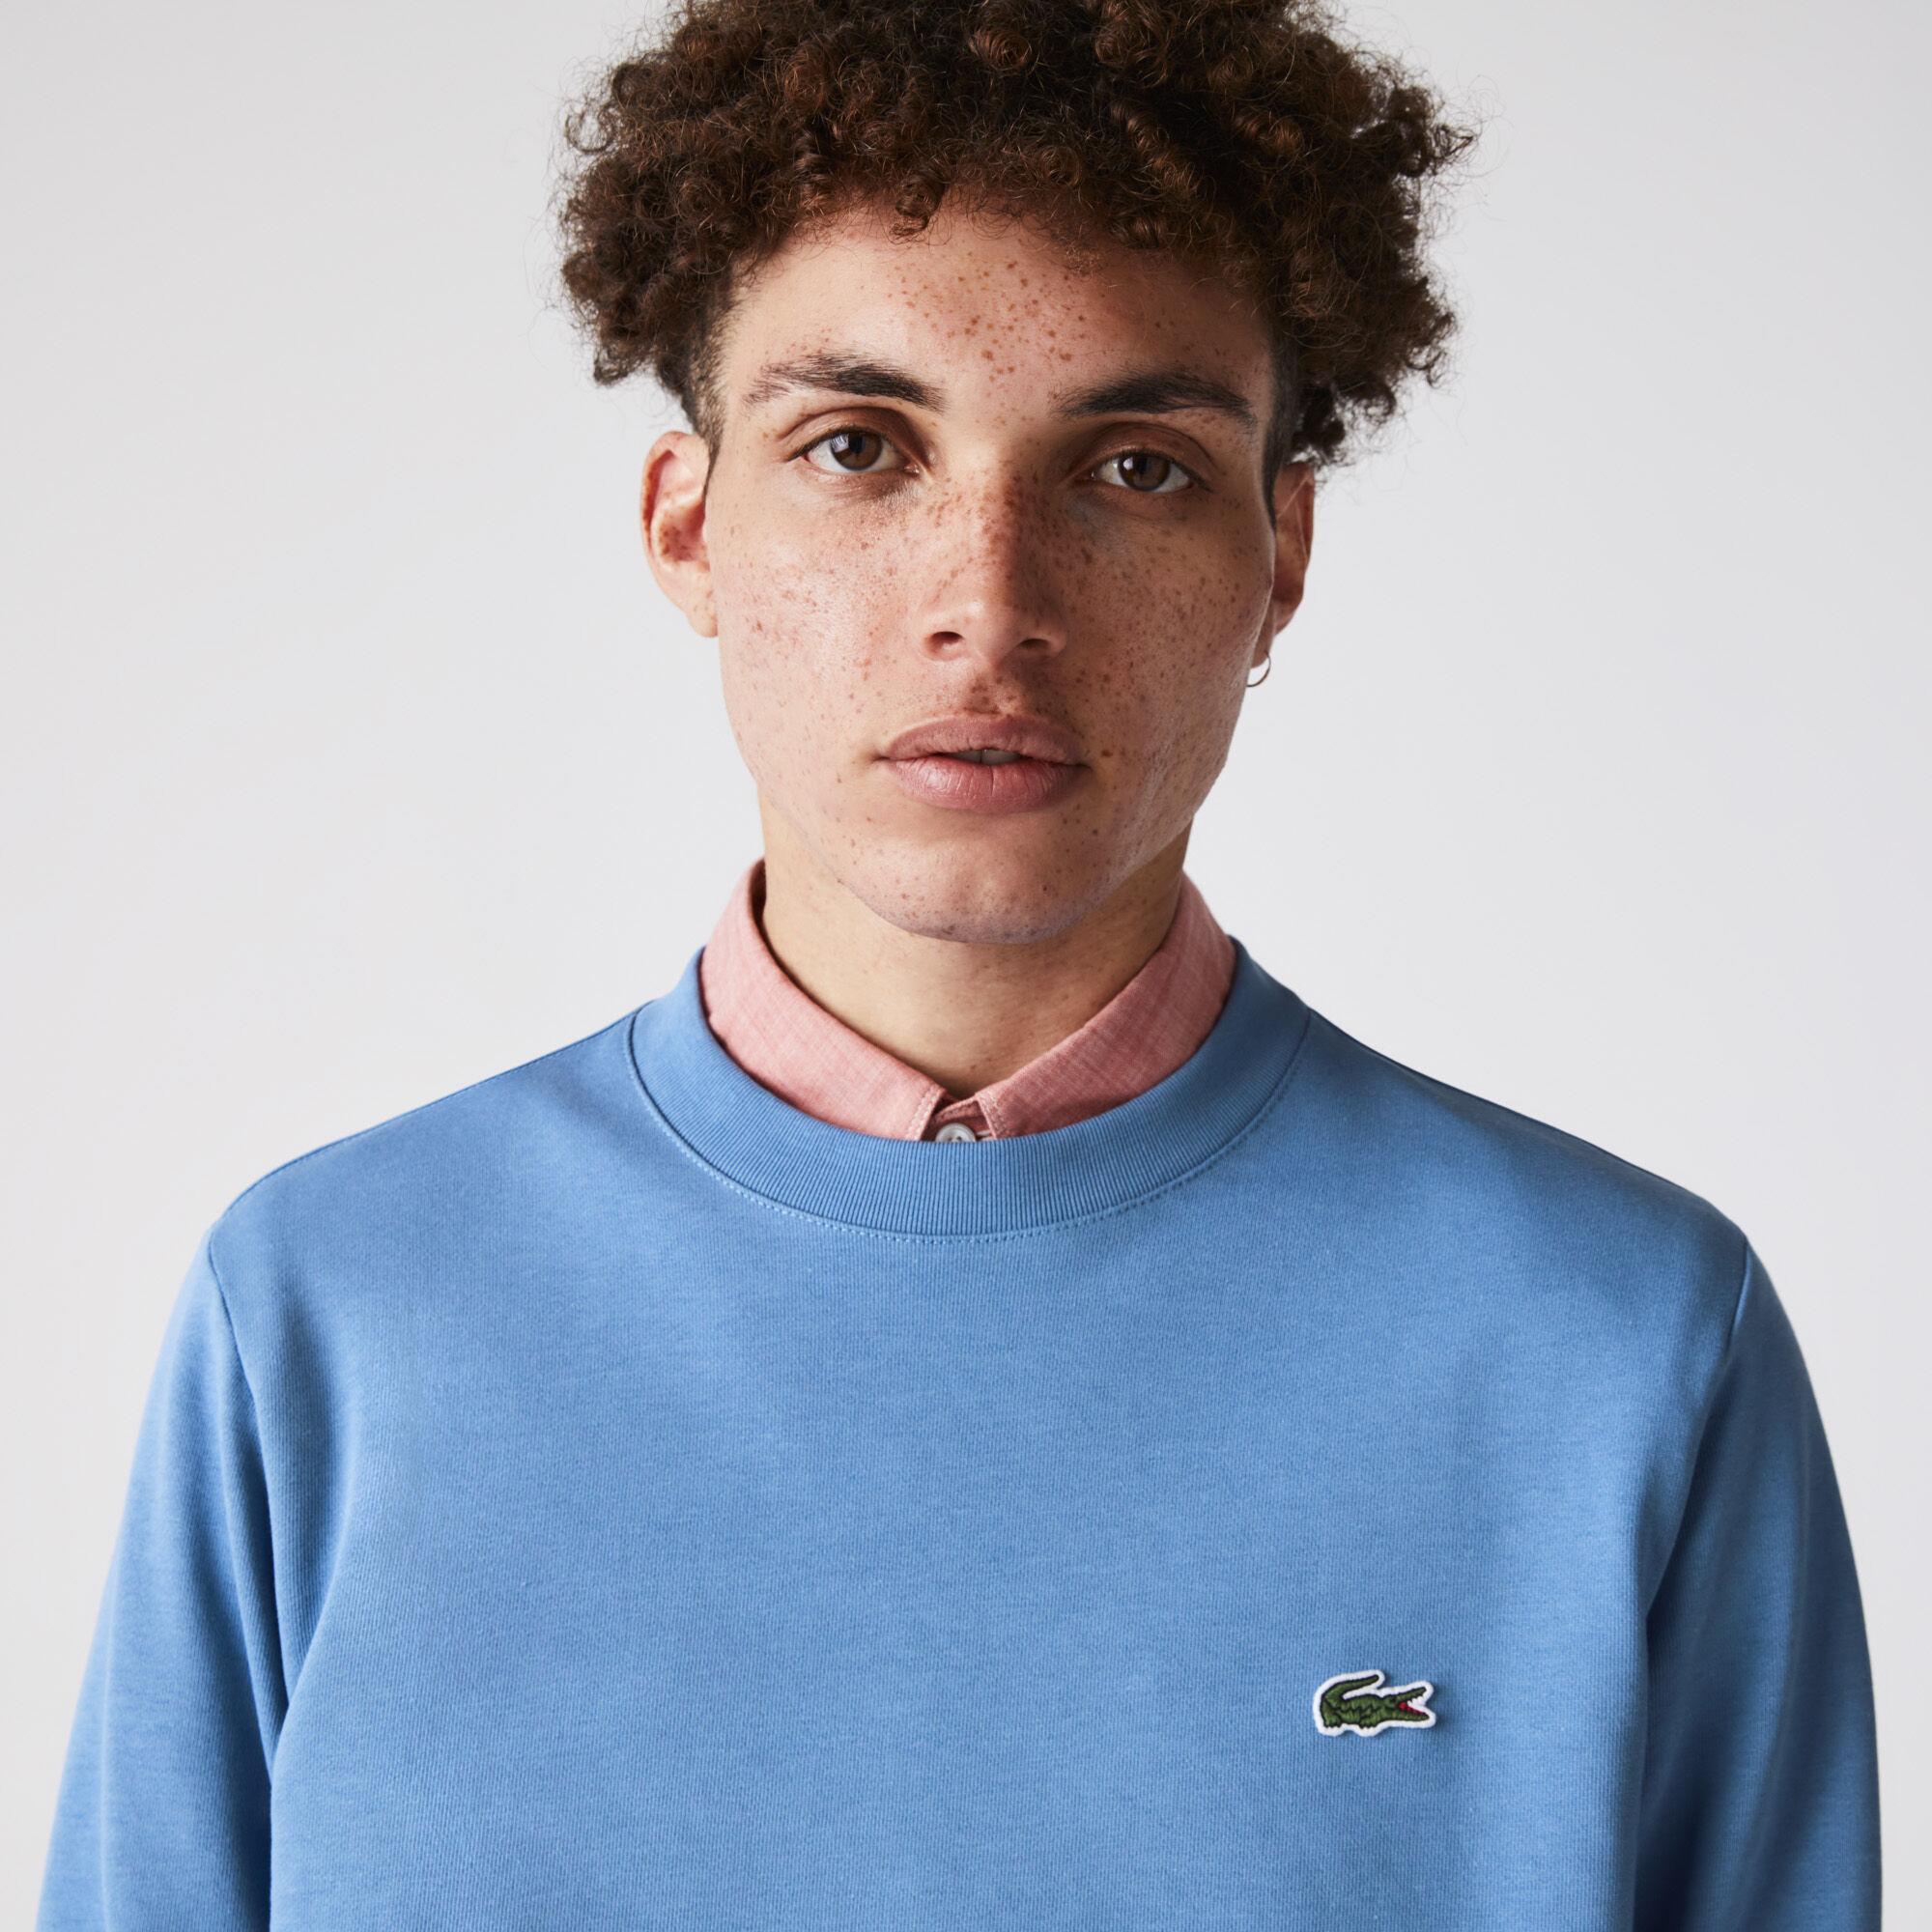 Men's Crocodile Print Organic Cotton Fleece Sweatshirt